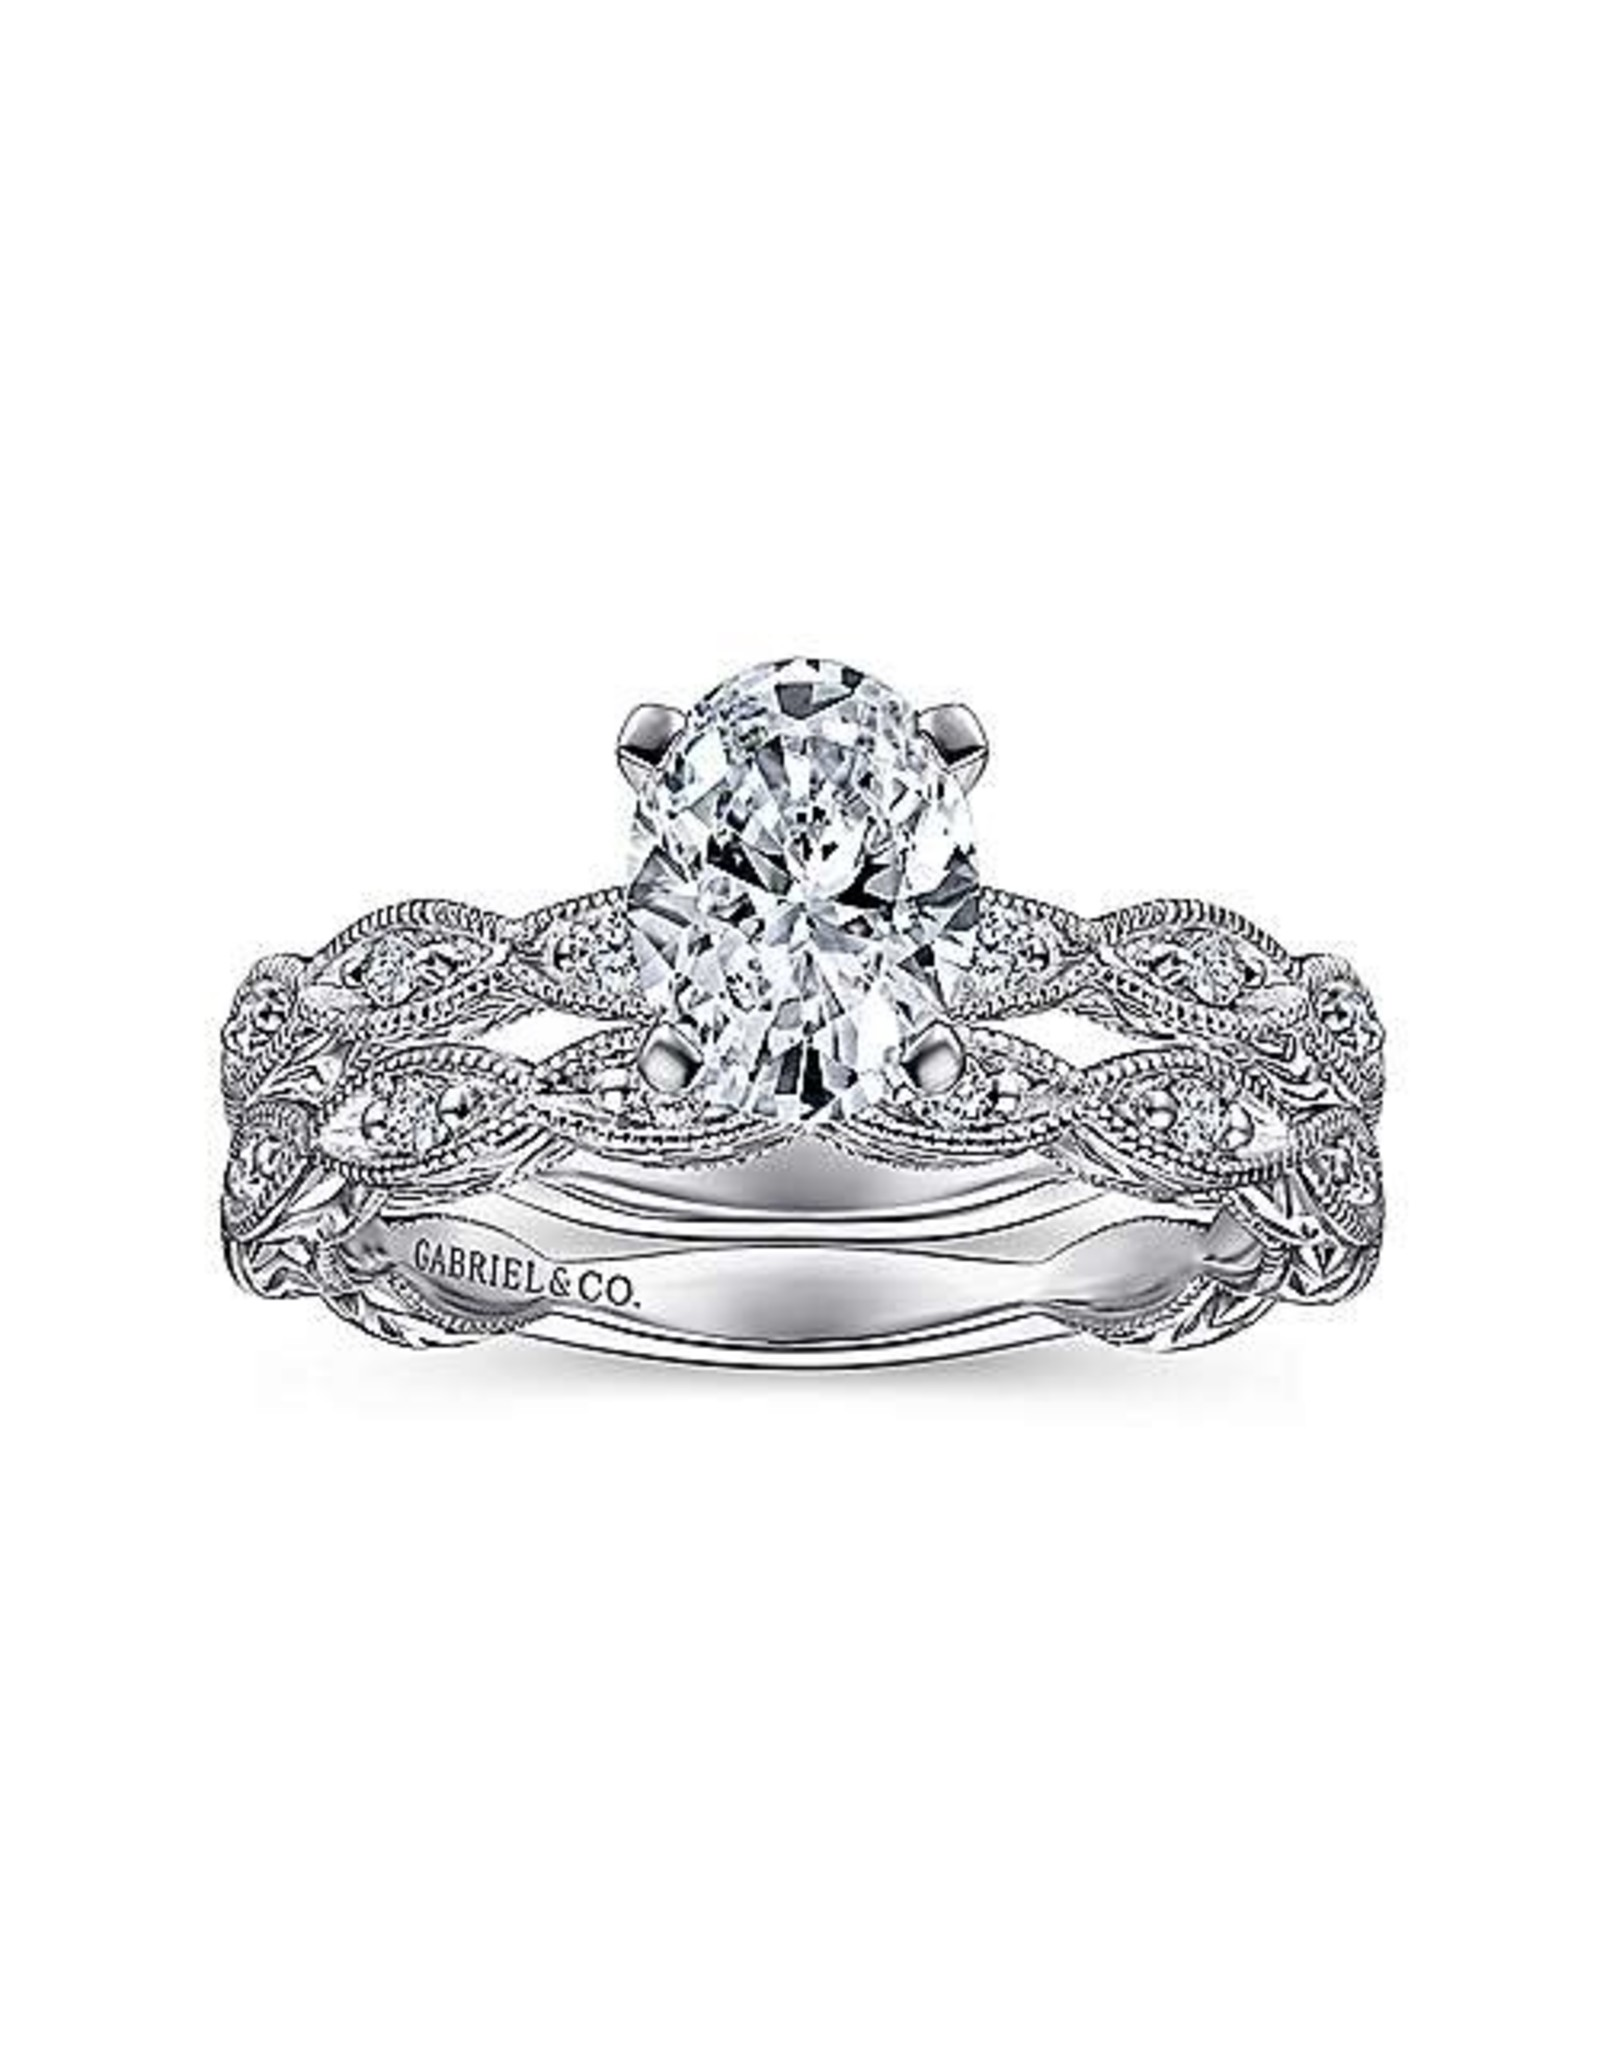 14K White Gold Oval Diamond  Engagement Ring, D: 0.81ct, F, VS2